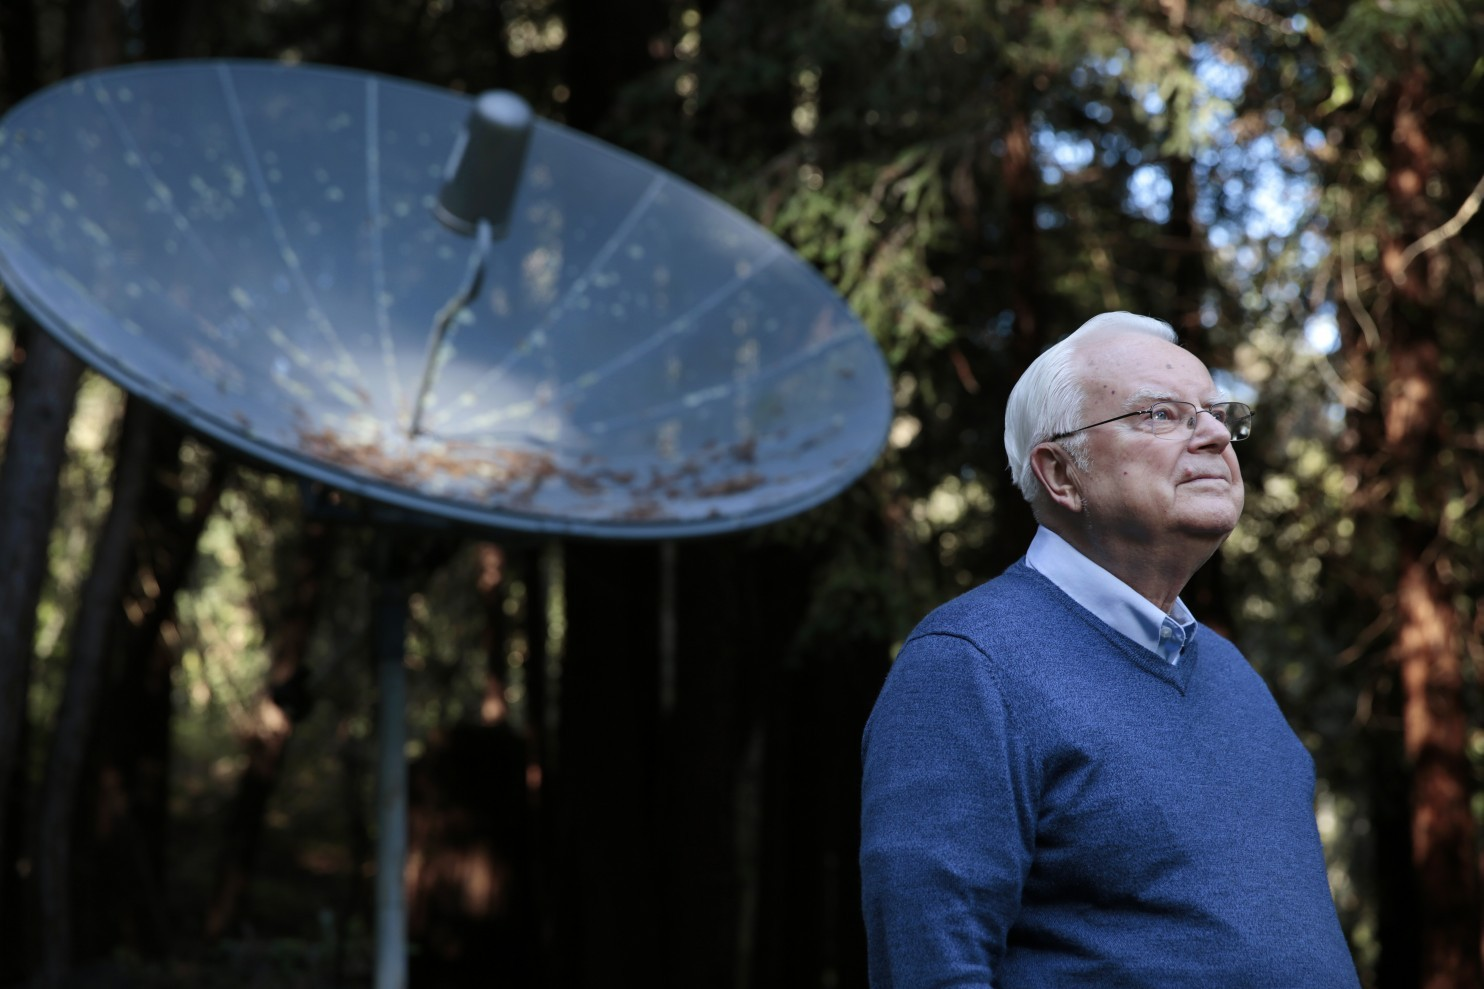 Astronomer, Frank Drake